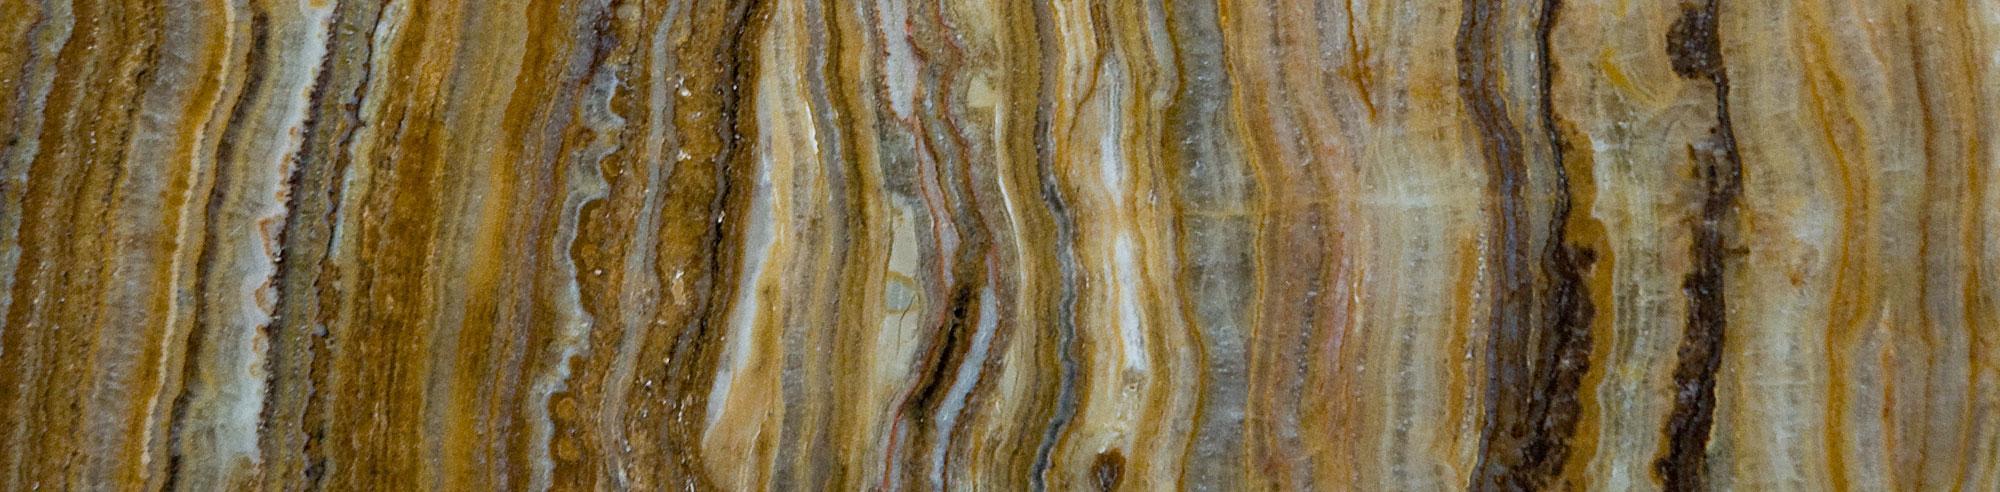 Onyx Wood Regulare